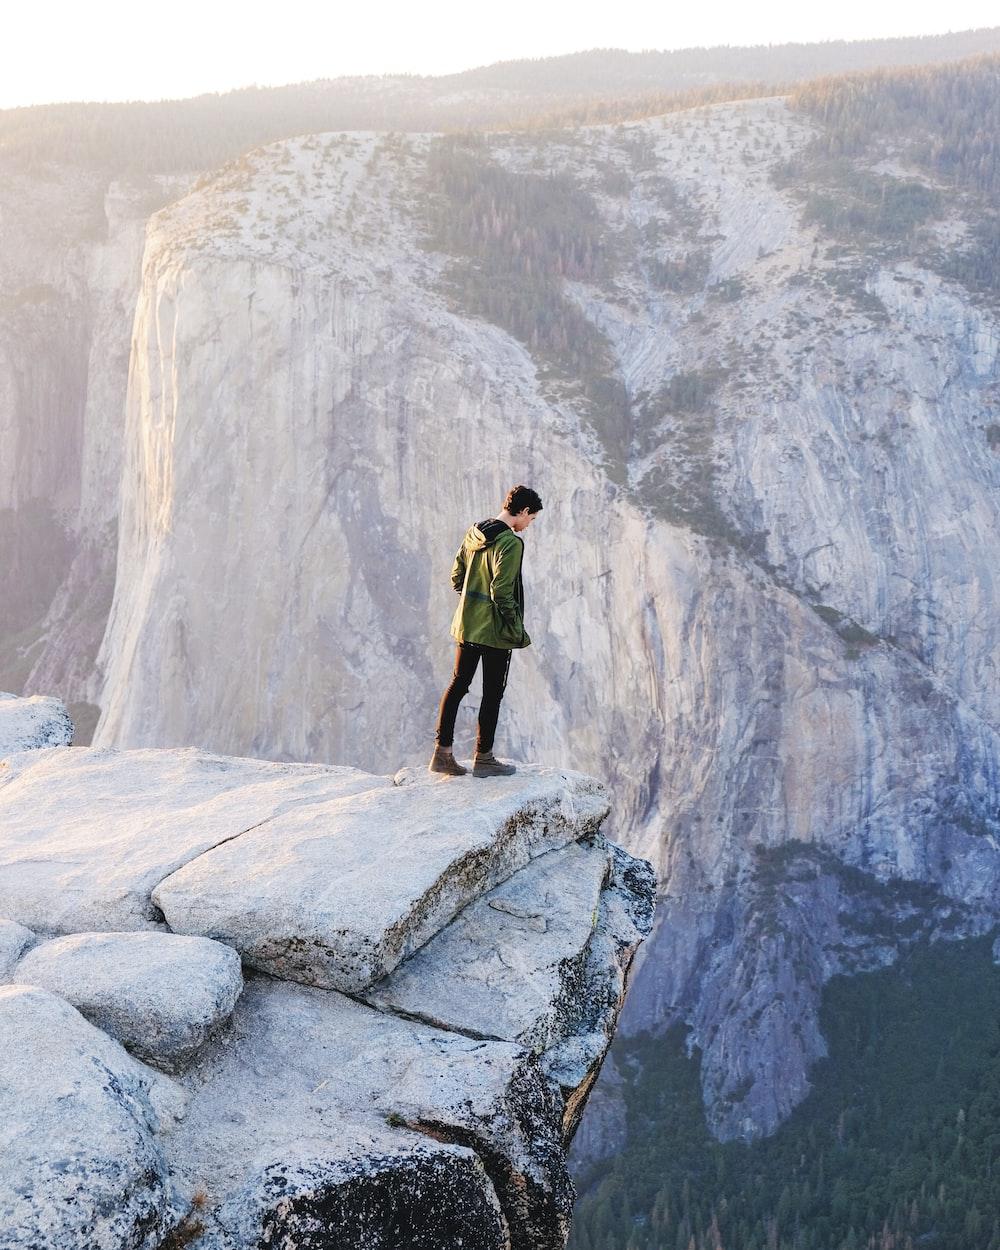 Yosemite Valley cliff | HD photo by Leio McLaren